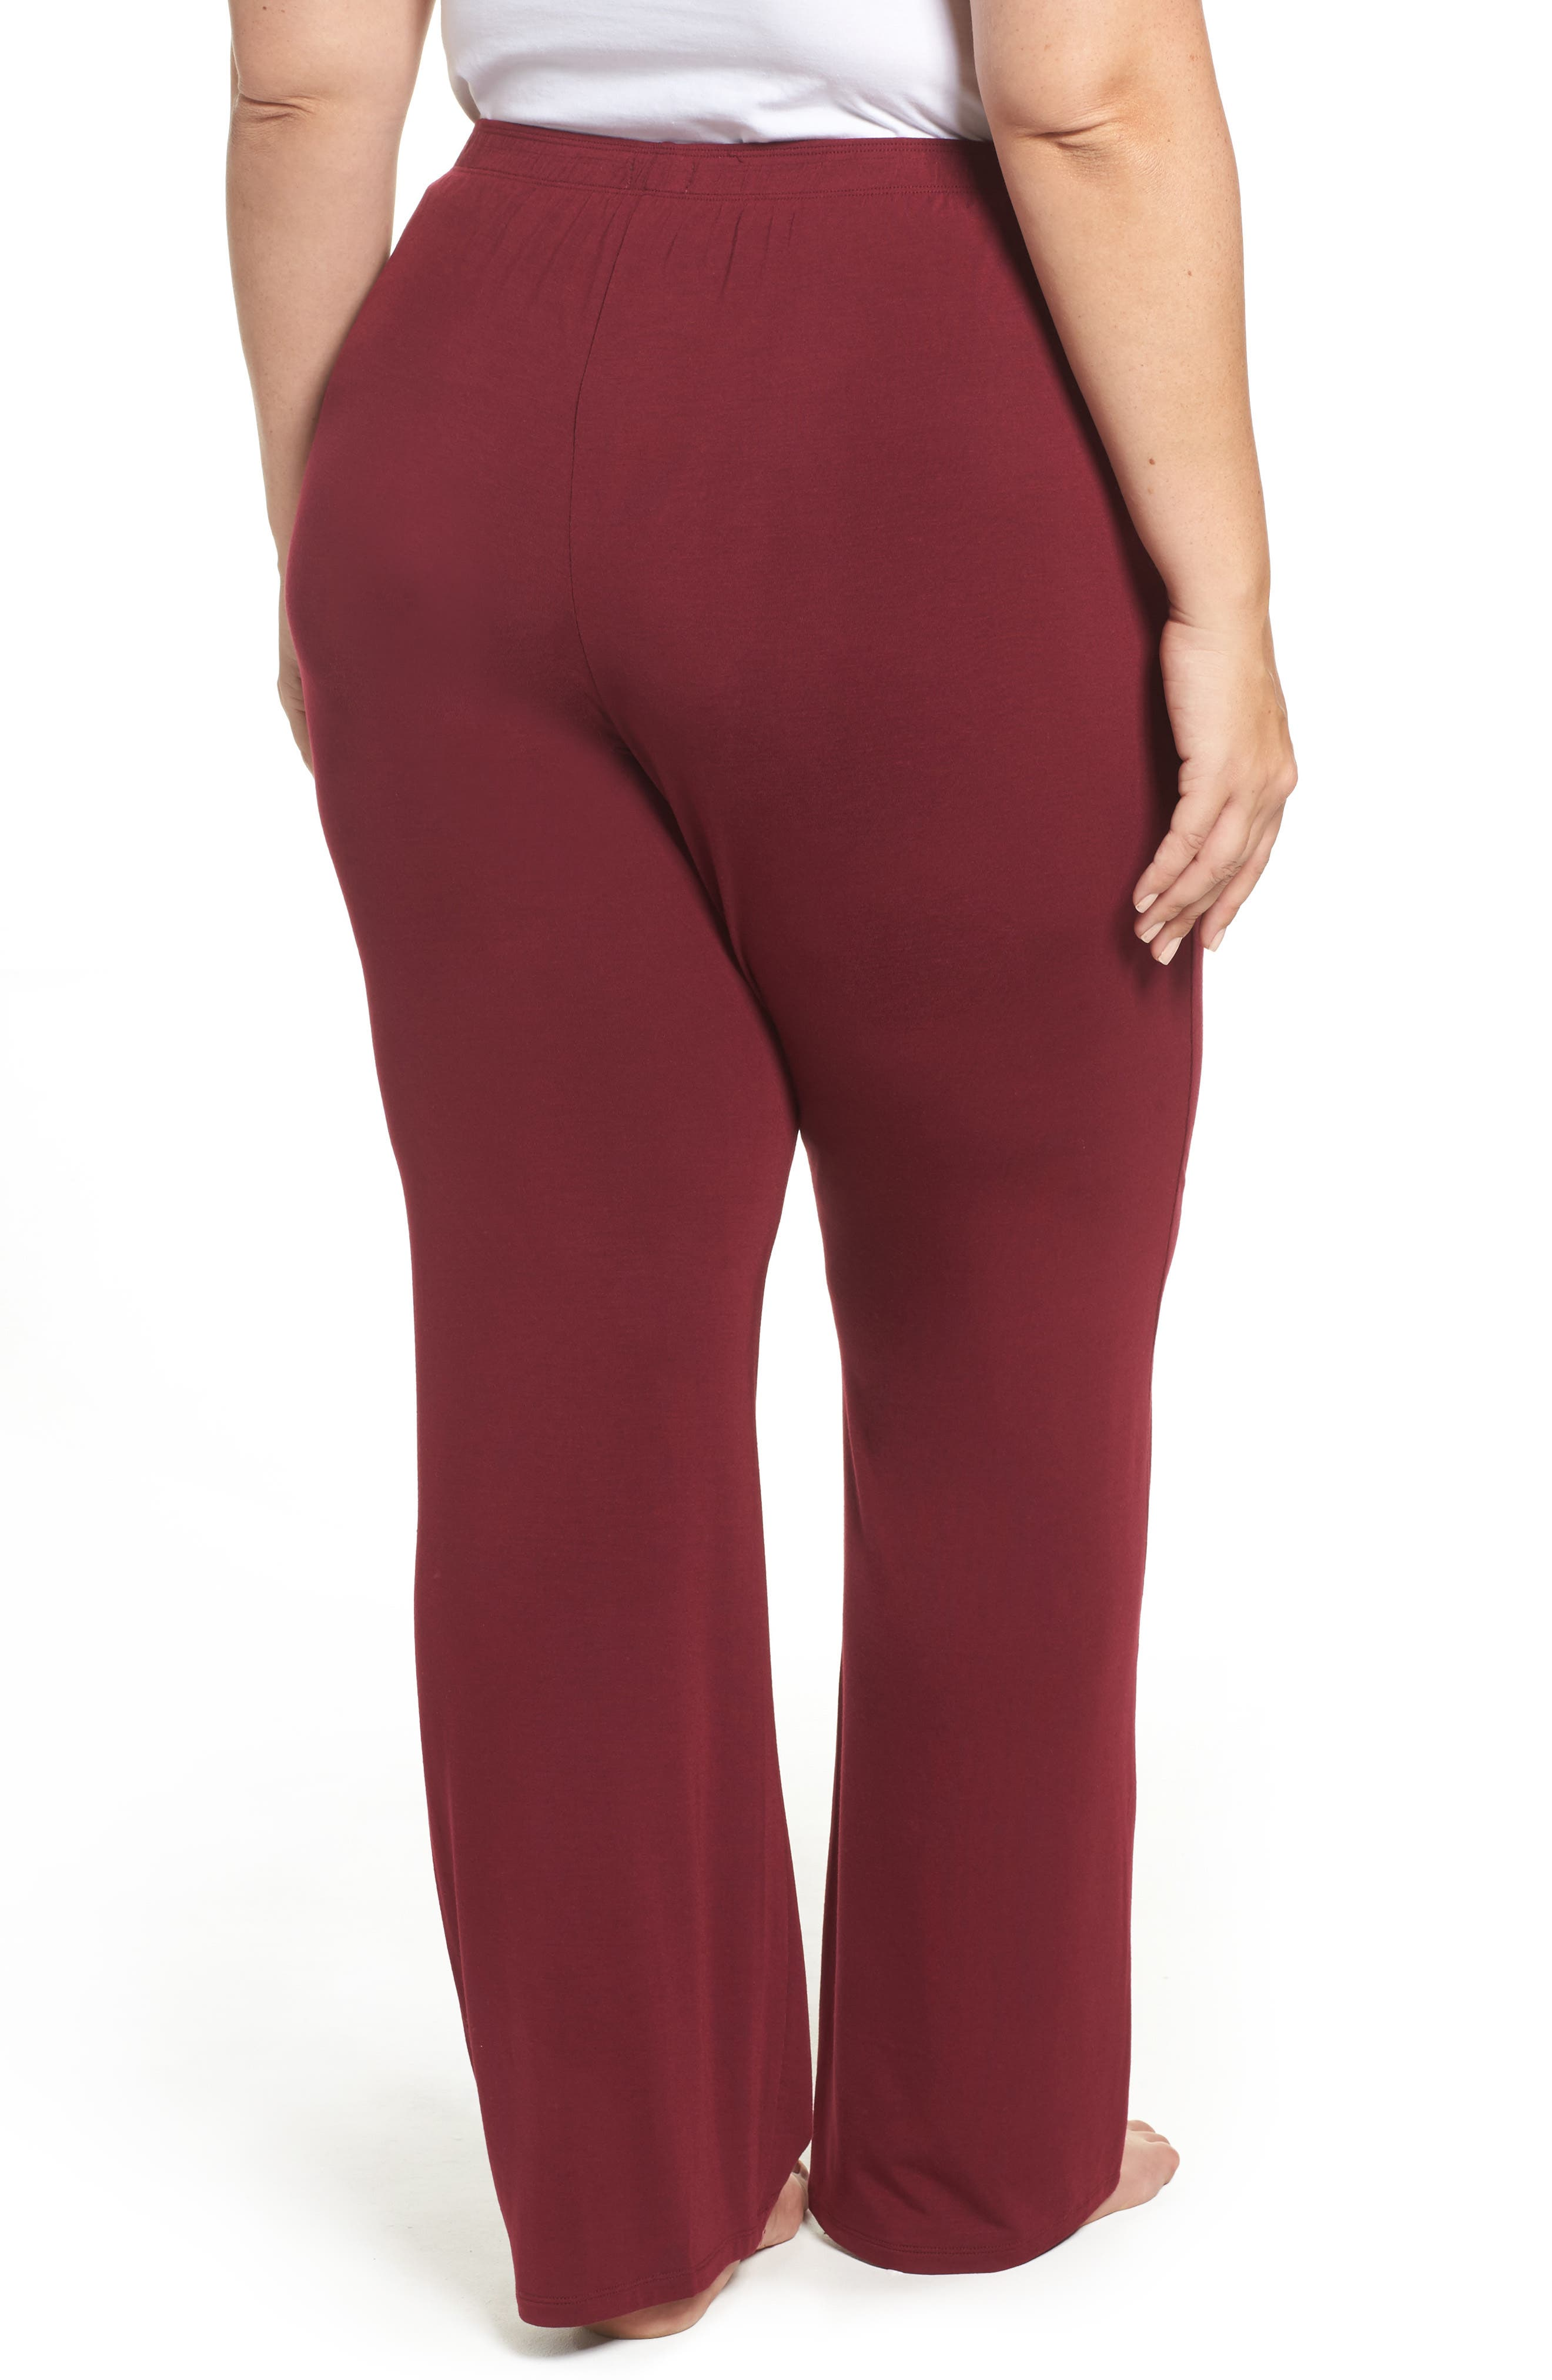 Lounge Pants,                             Alternate thumbnail 2, color,                             930